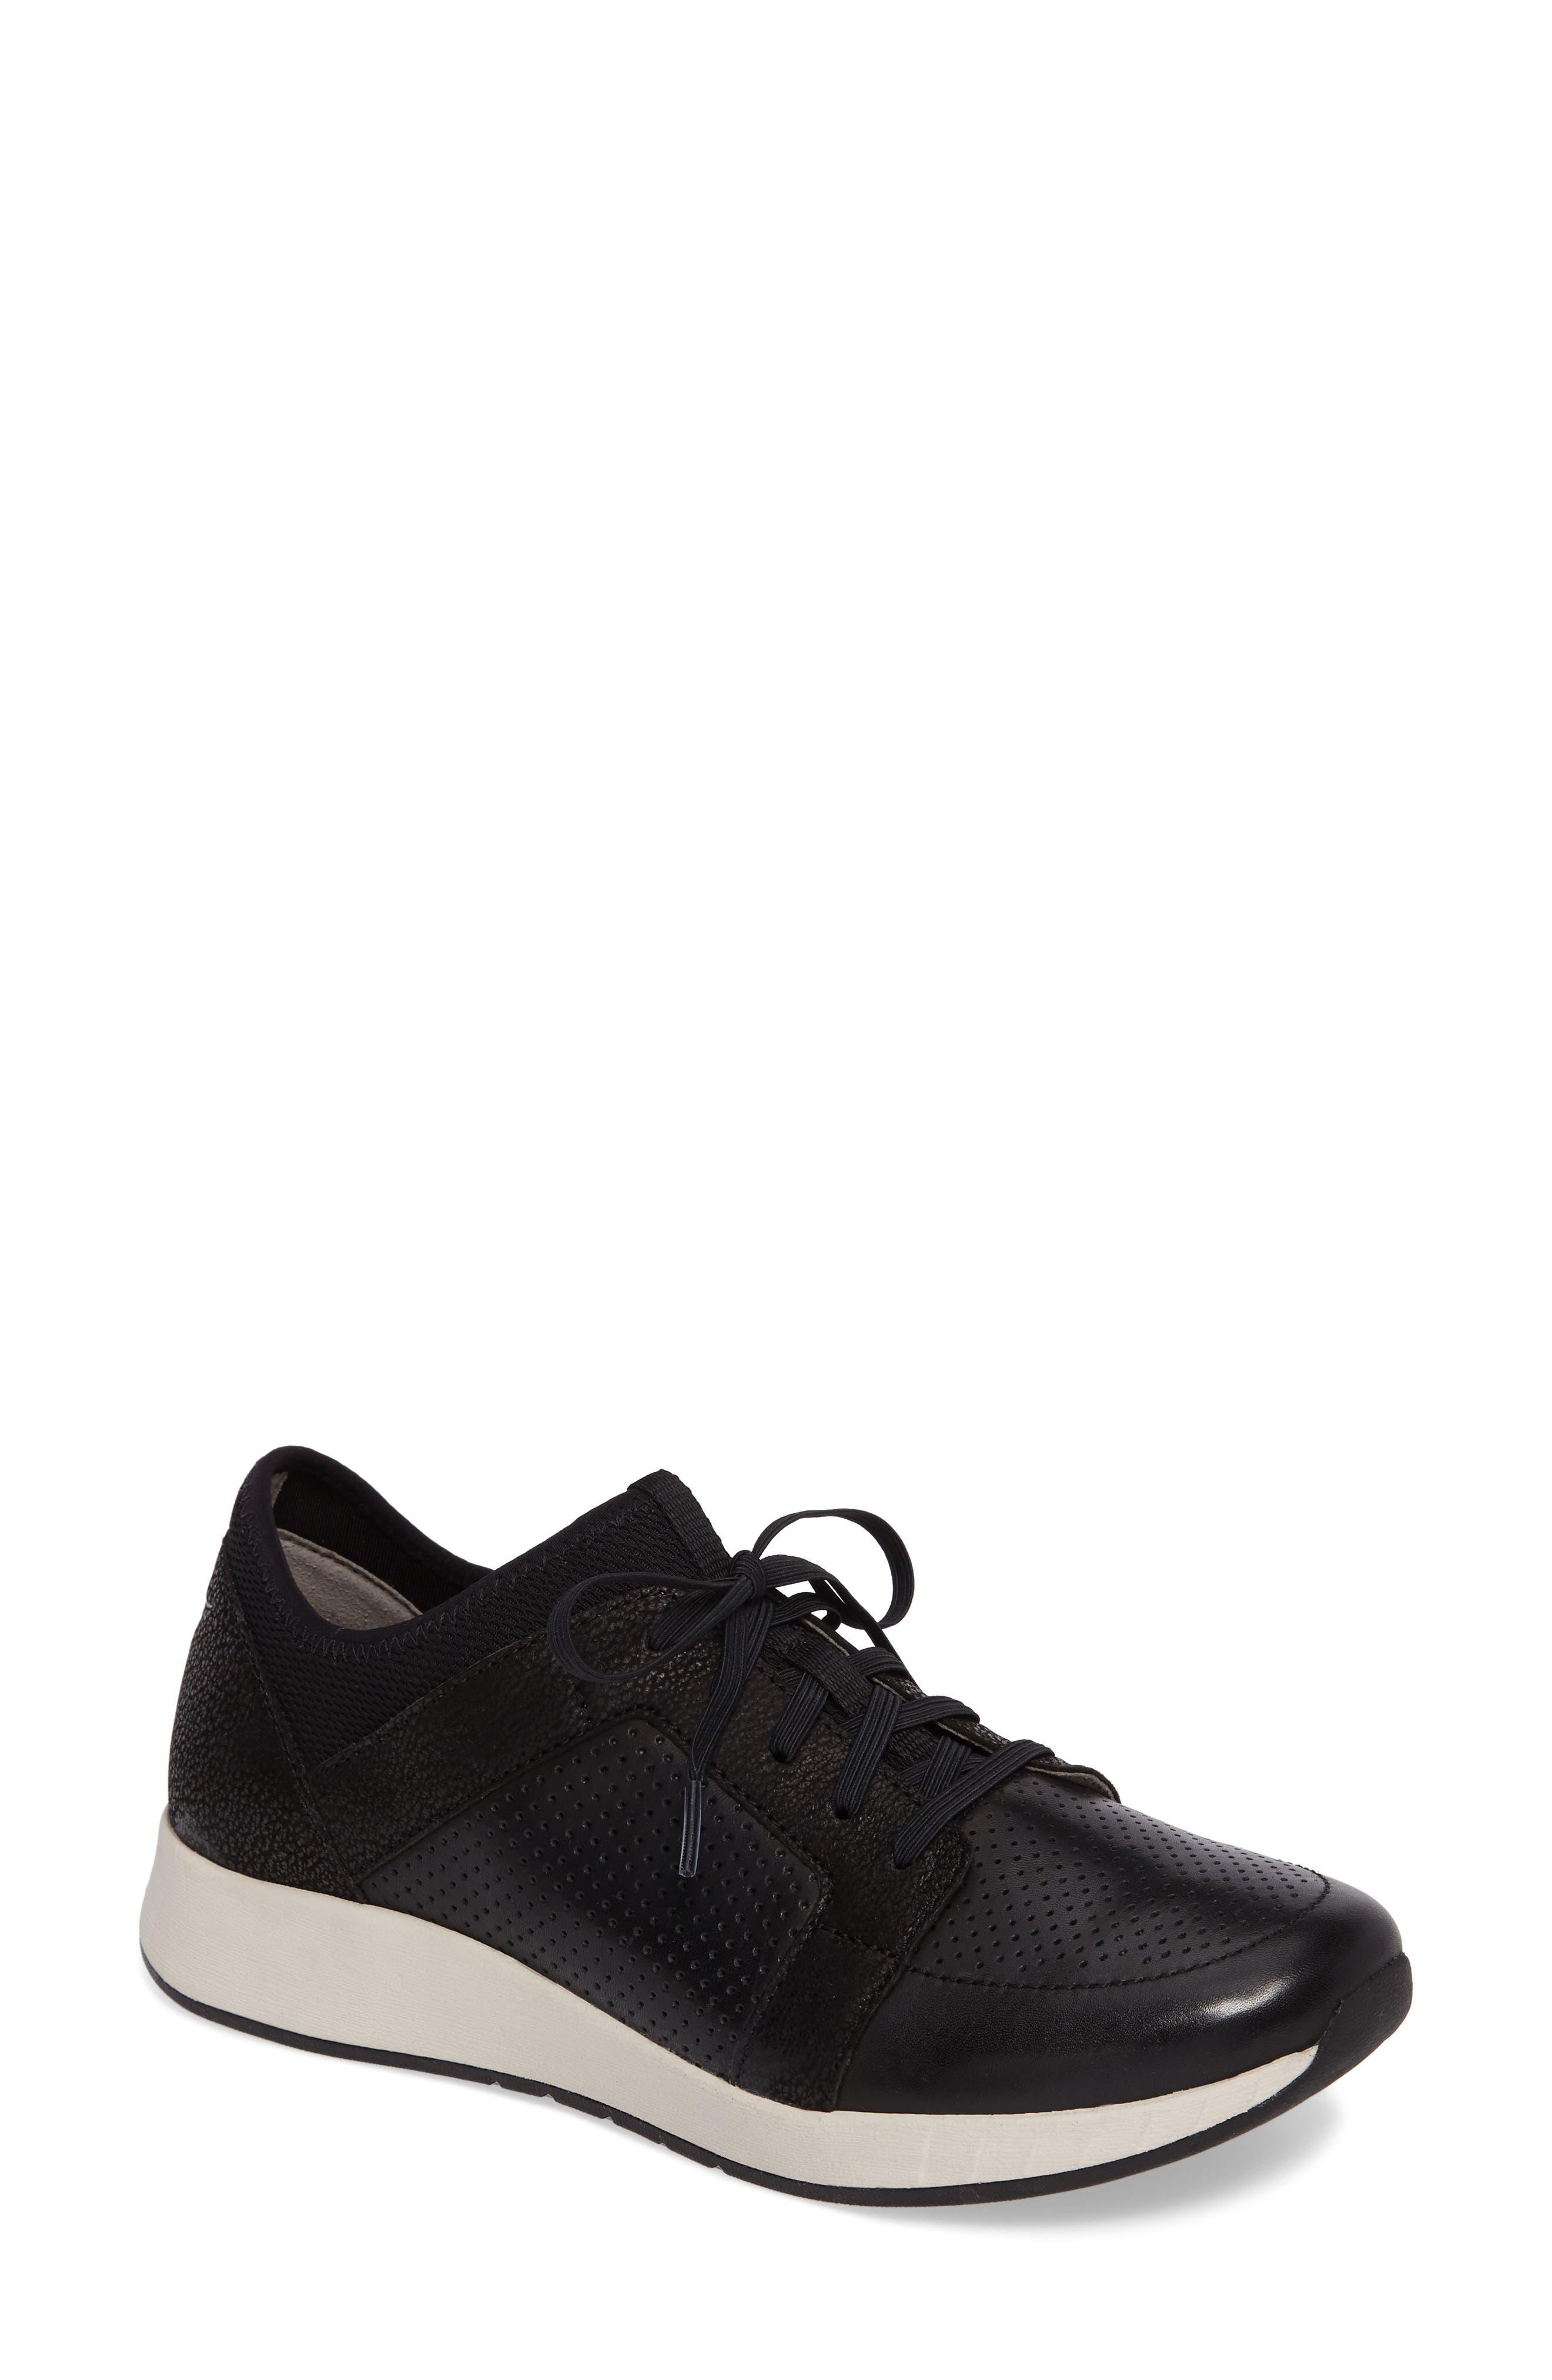 Cozette Slip-On Sneaker,                         Main,                         color, 001